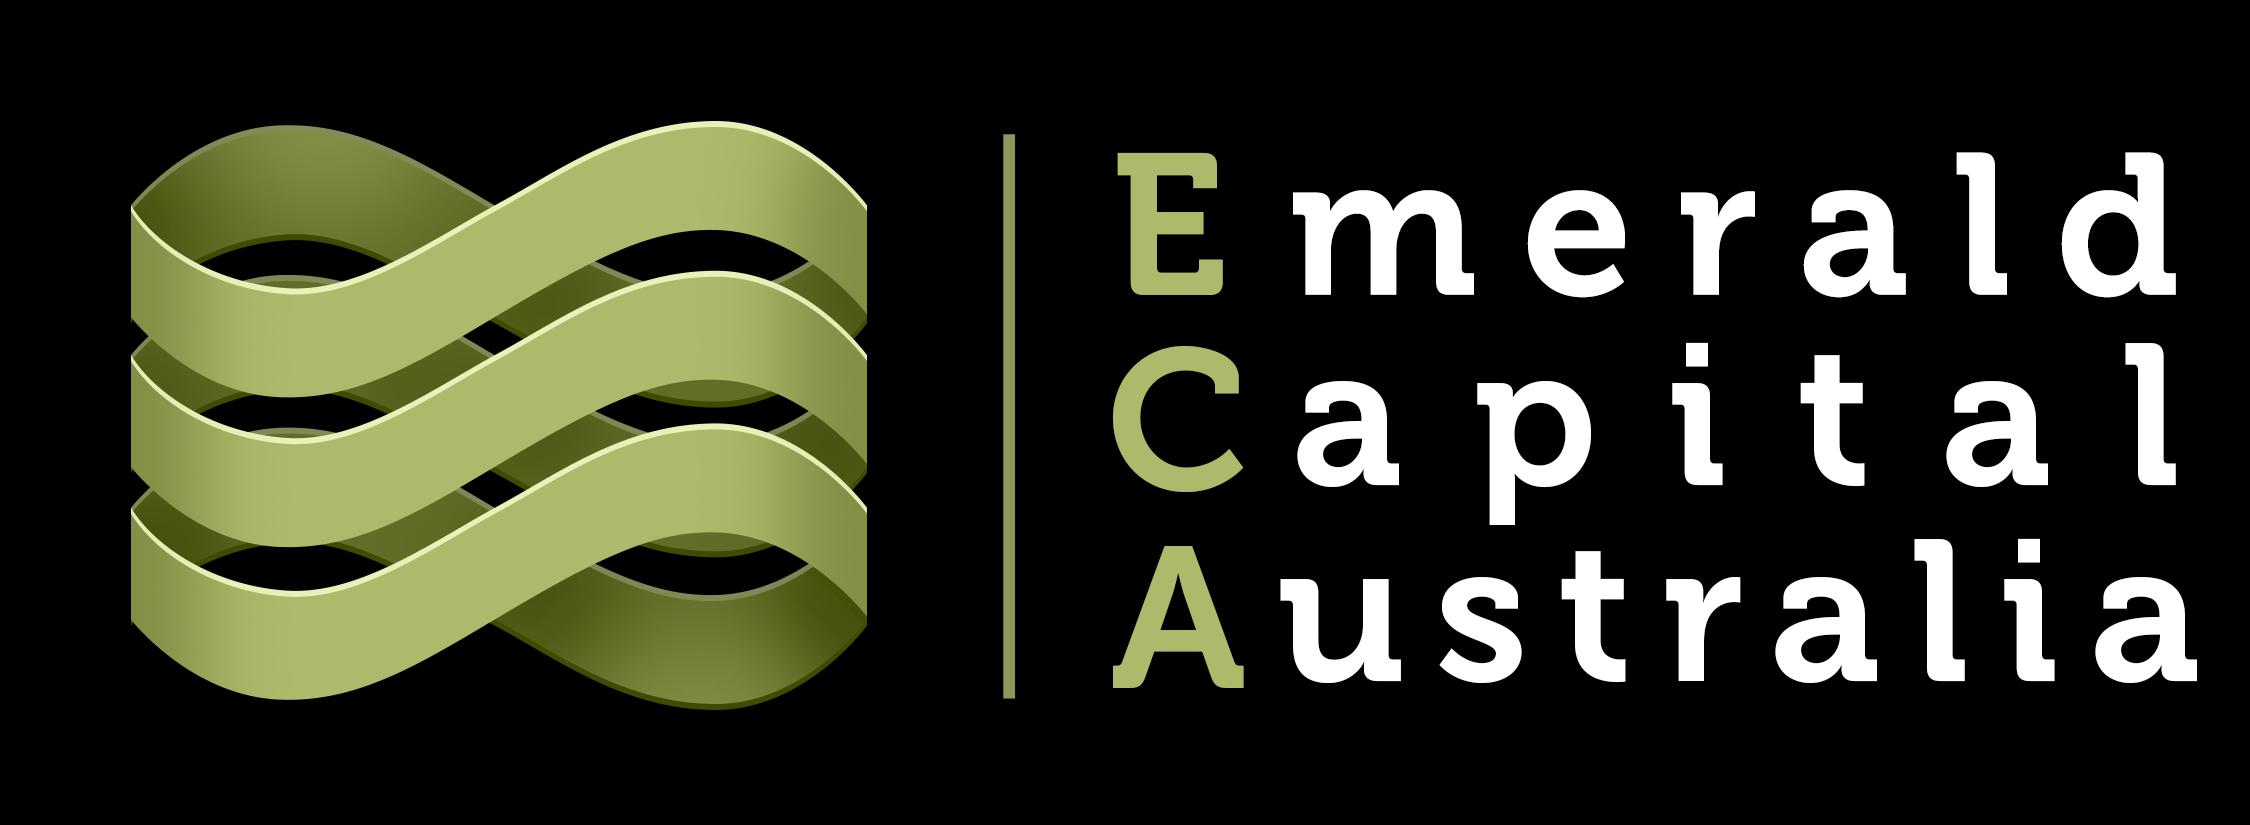 Emerald Capital Australia